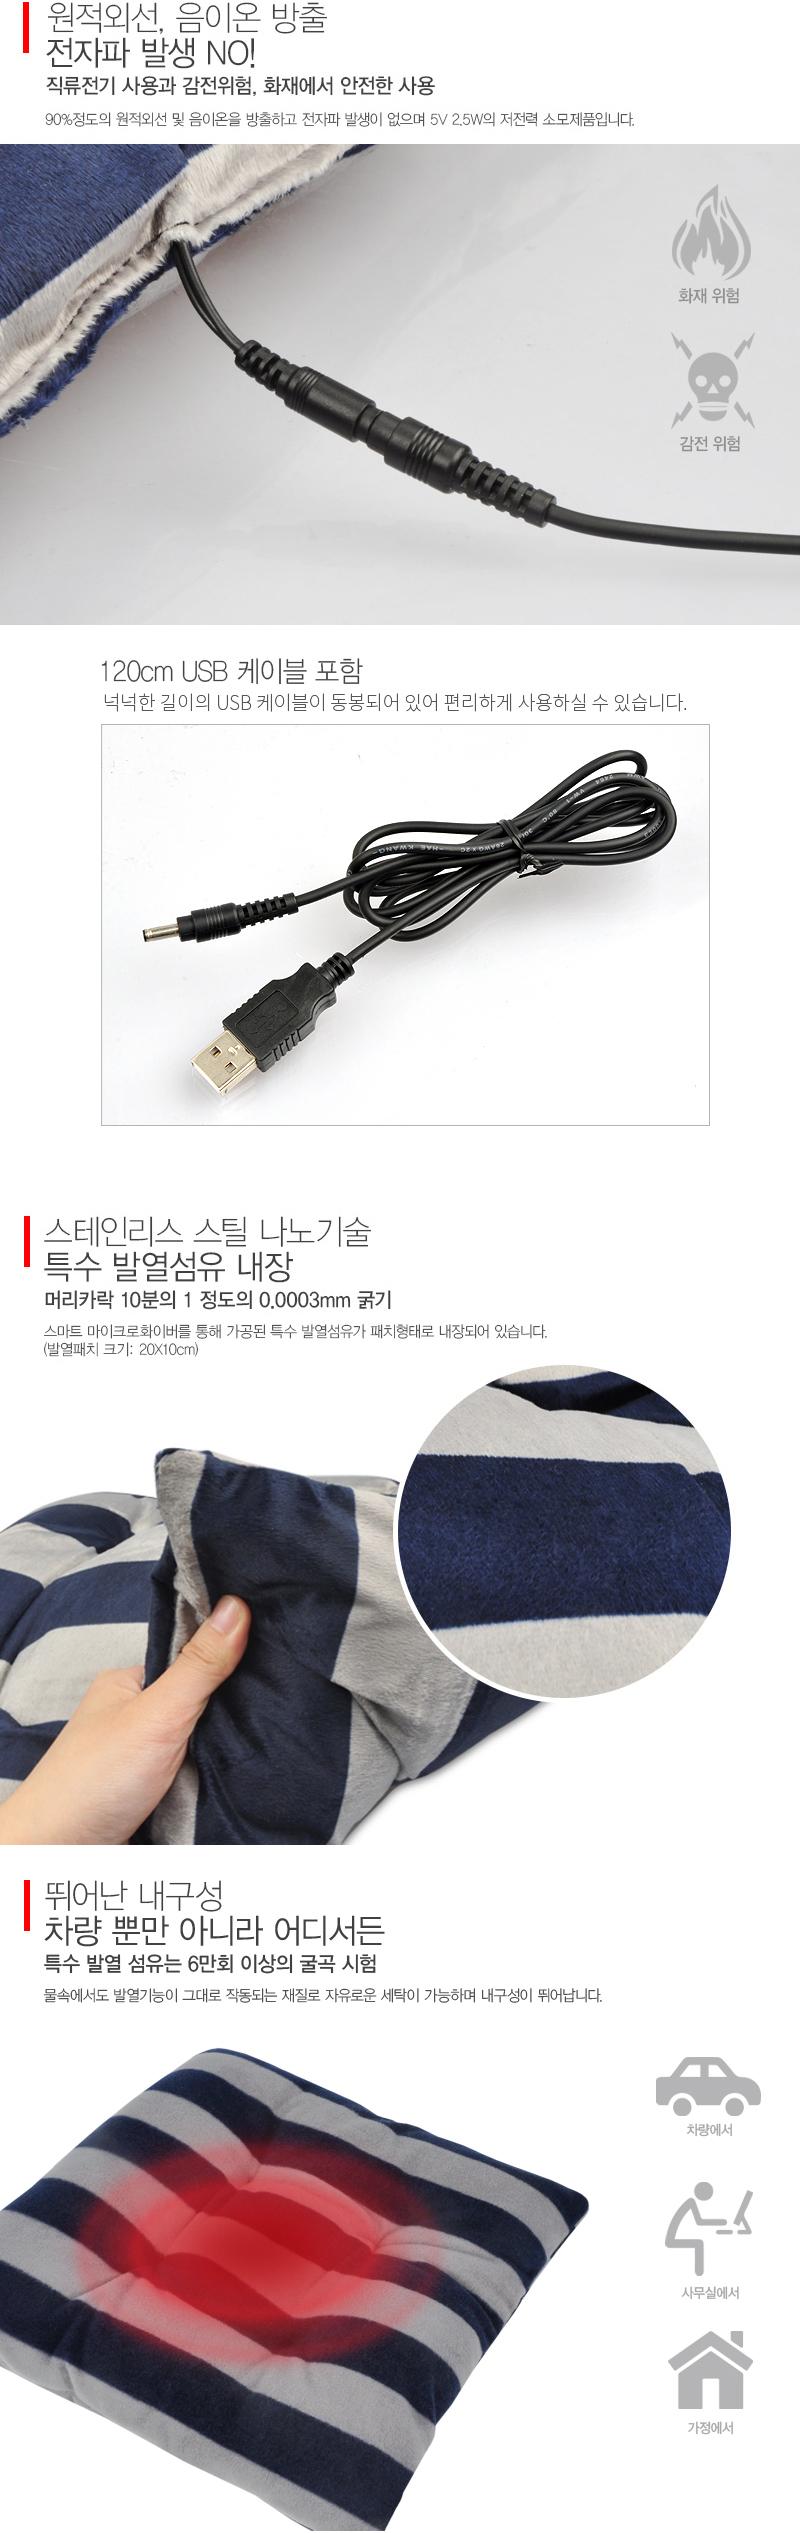 USB 온열 방석 - 훠링, 9,900원, 카인테리어, 실내 악세서리